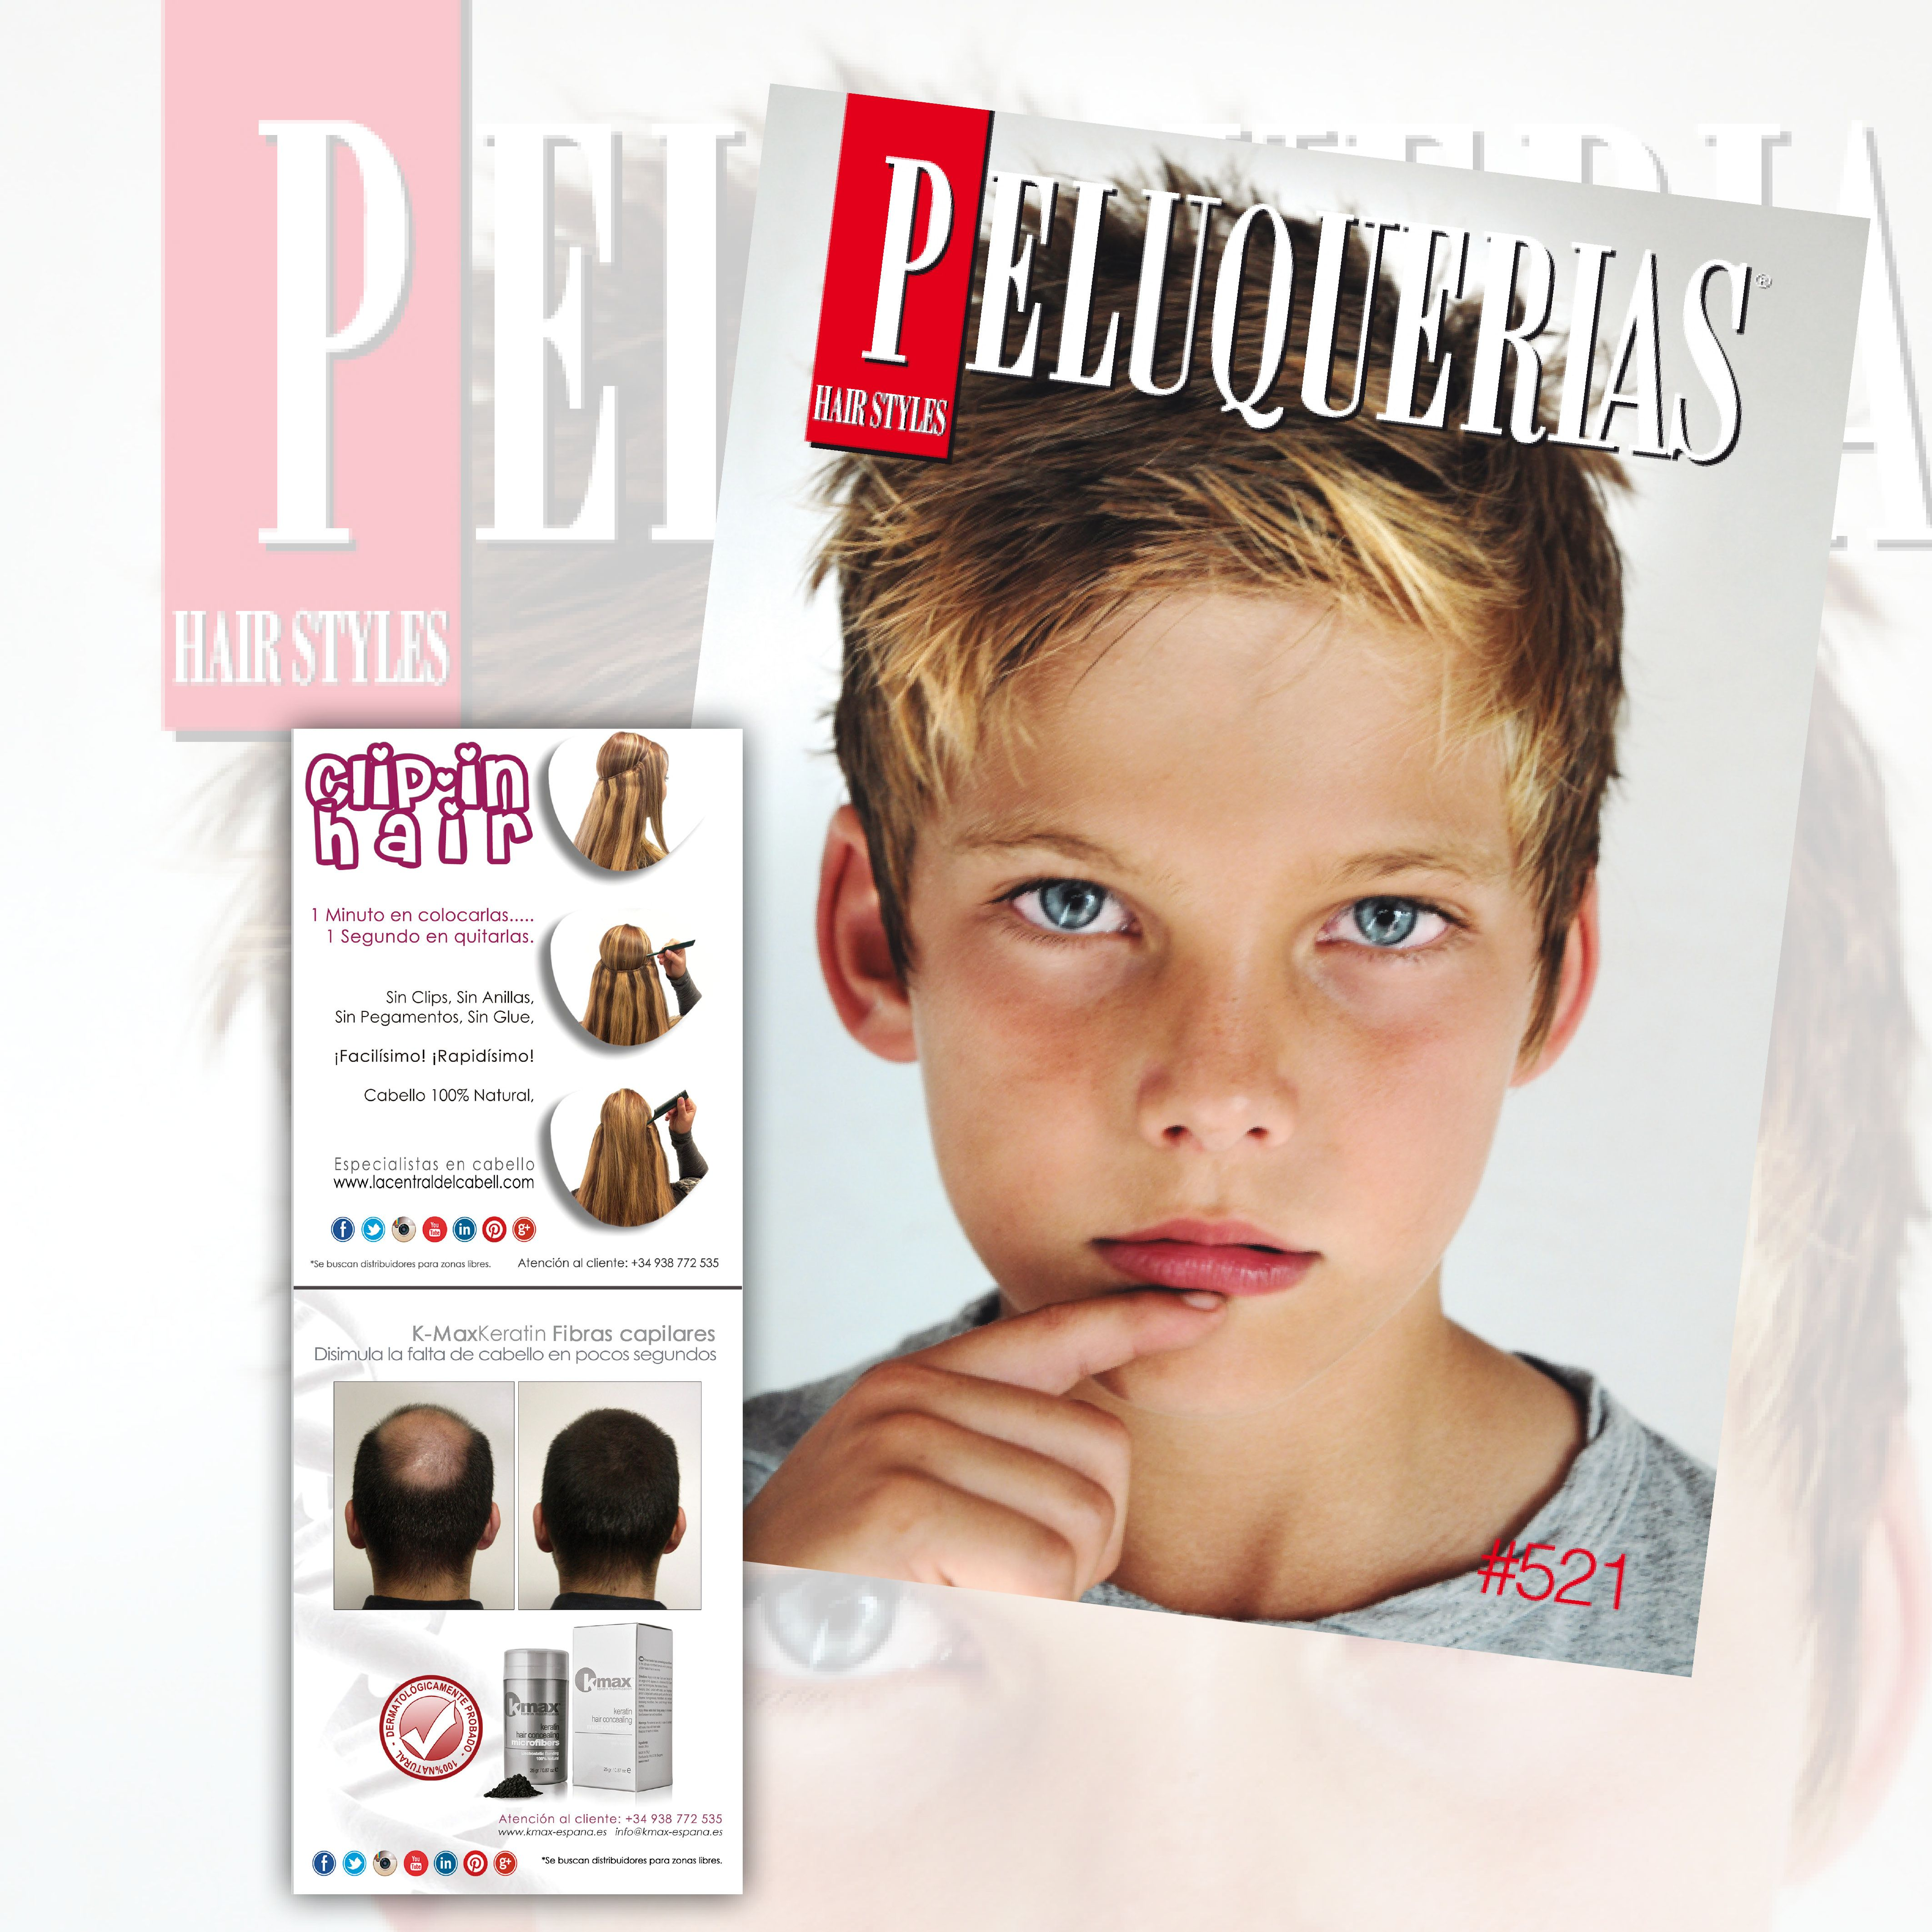 LA CENTRAL DEL CABELL visto en/as seen on #revistapeluquerias #PHS521 +info http://facebook.com/lacentraldelcabell …  +34 938 772 535